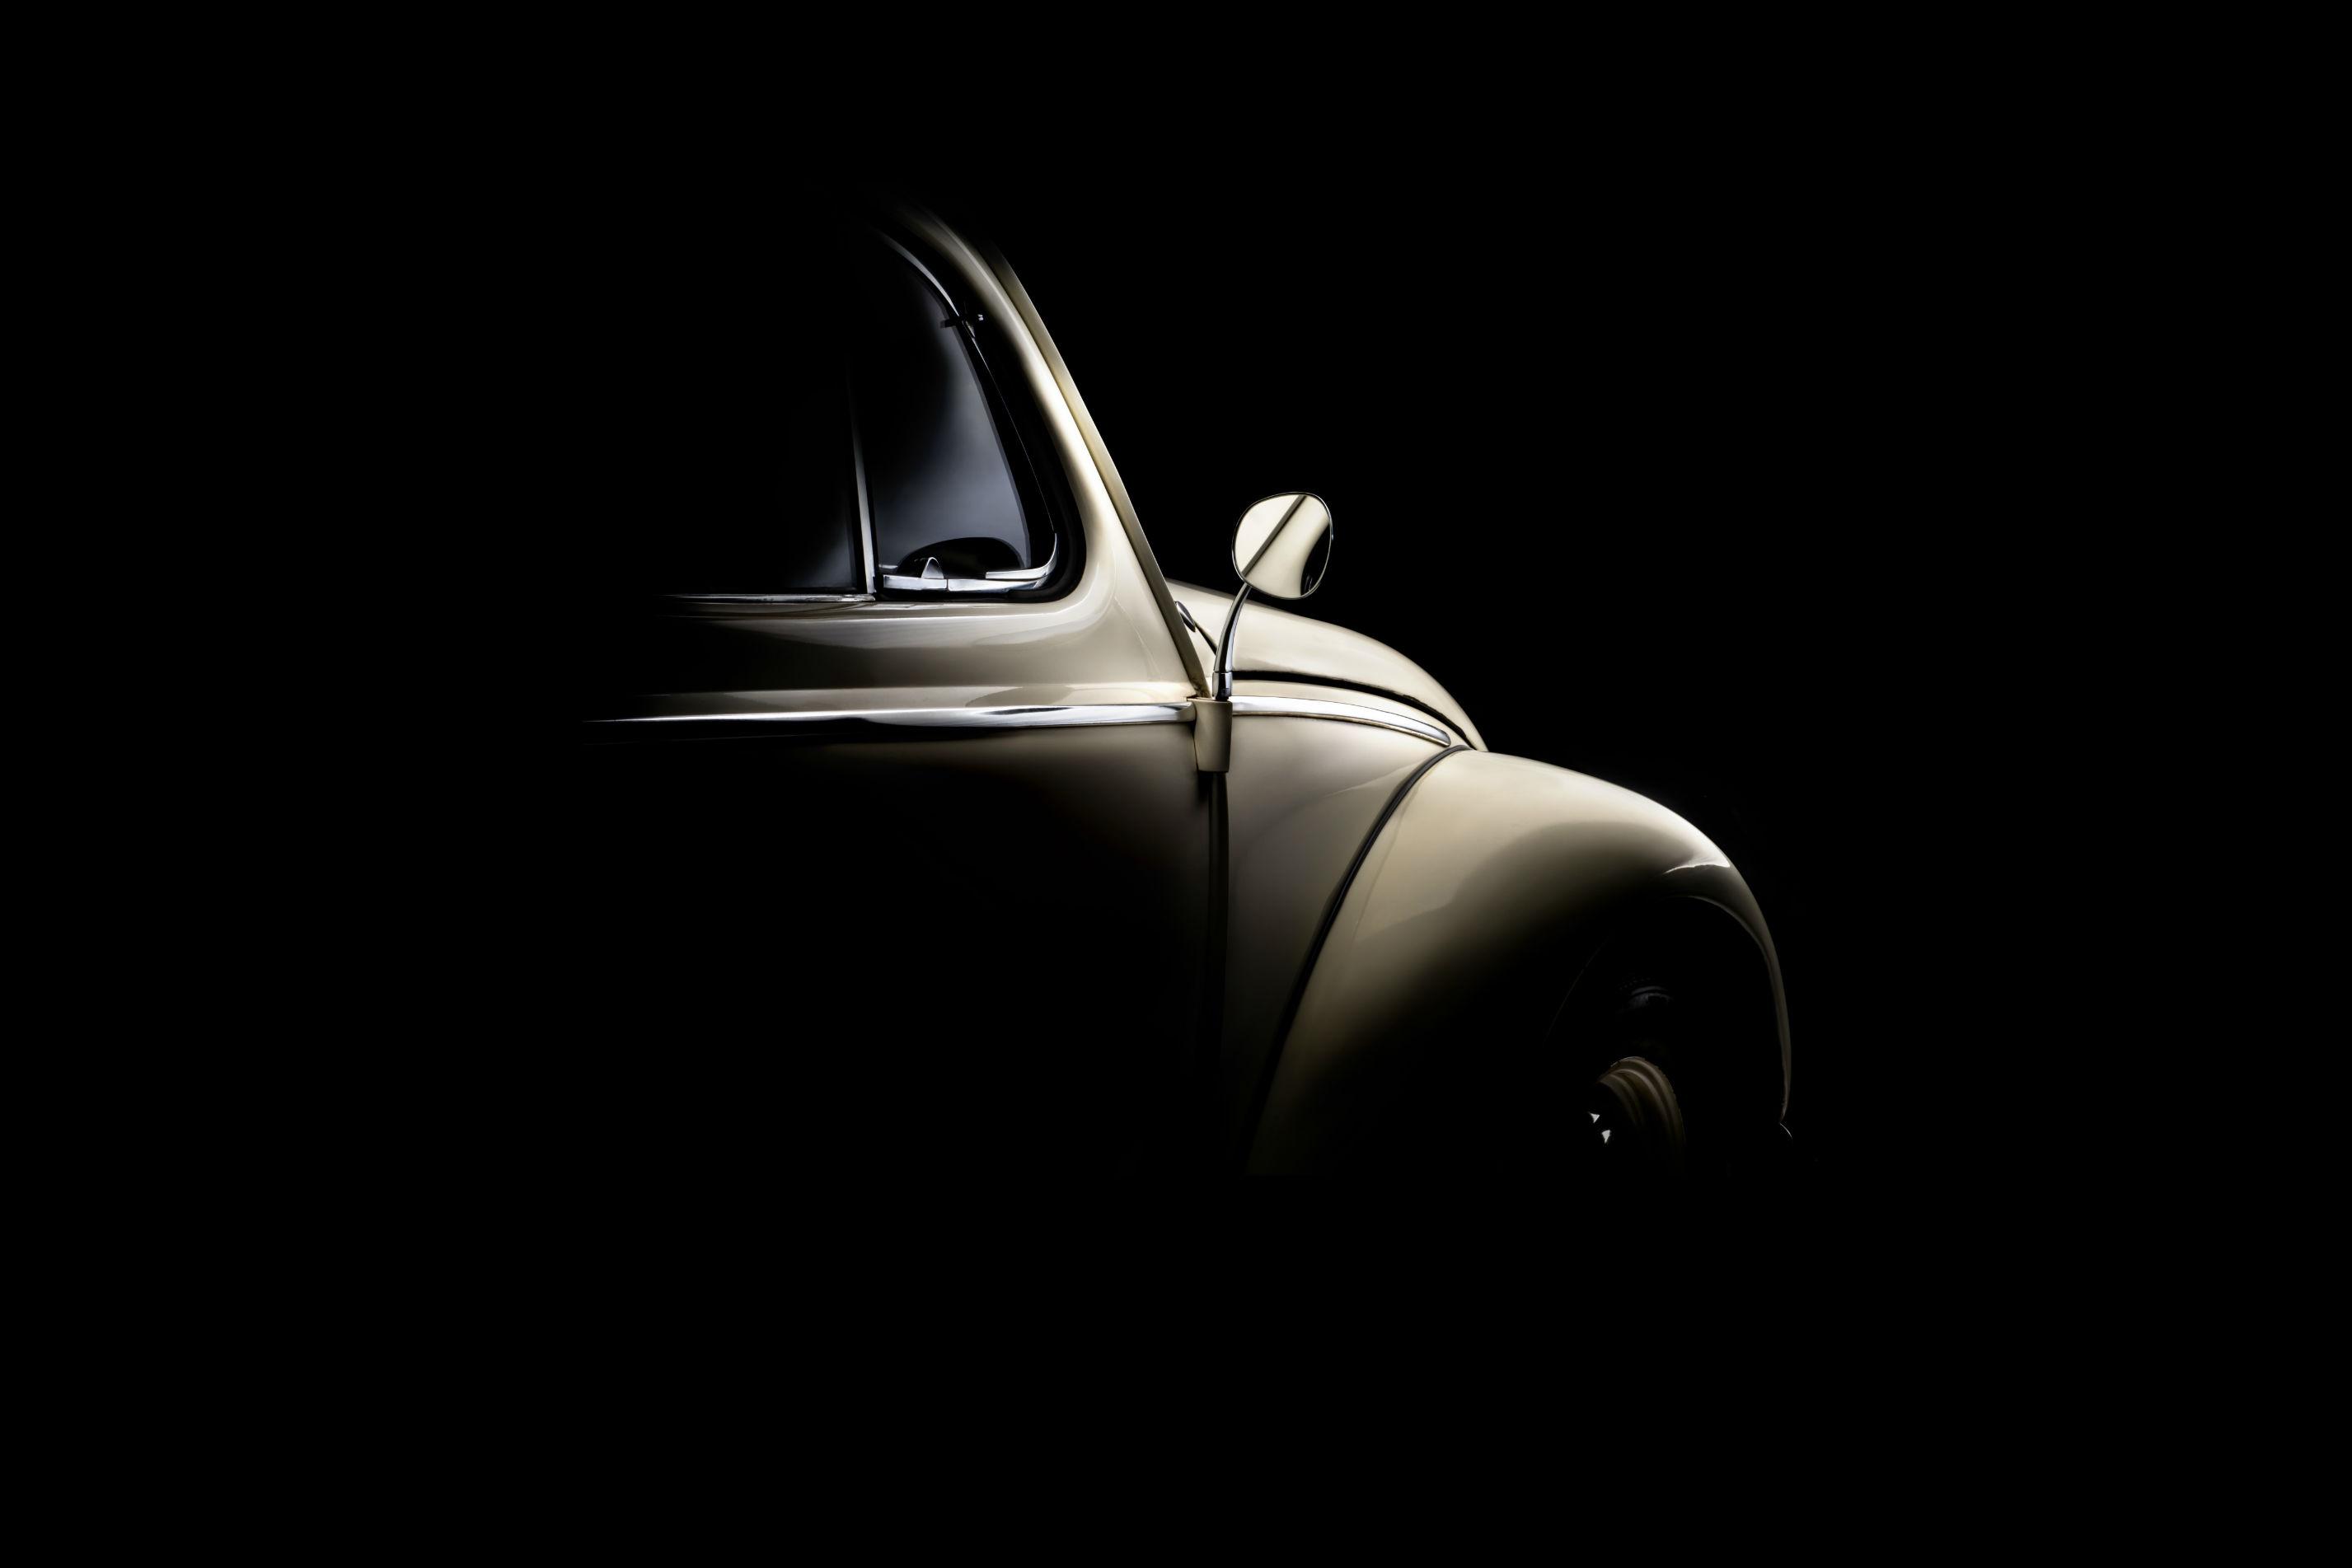 VW beetle_classic_automotive_1a_sarel_photowise-002-small